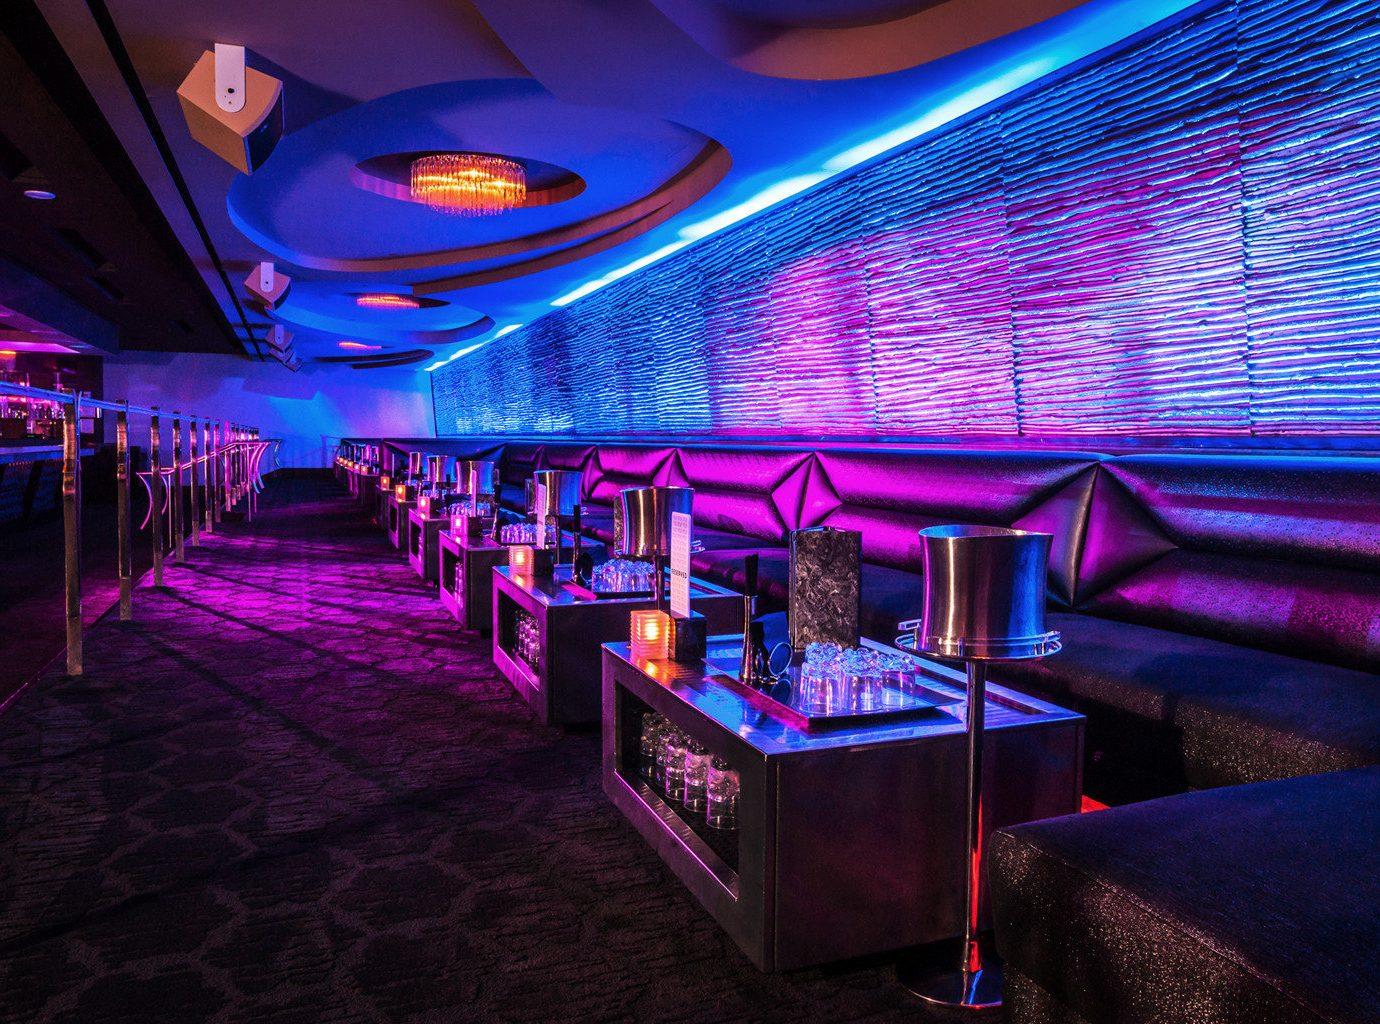 Bar Casino Drink Lounge Modern Nightlife Travel Trends Trip Ideas floor indoor nightclub room ceiling function hall music venue disco club purple furniture